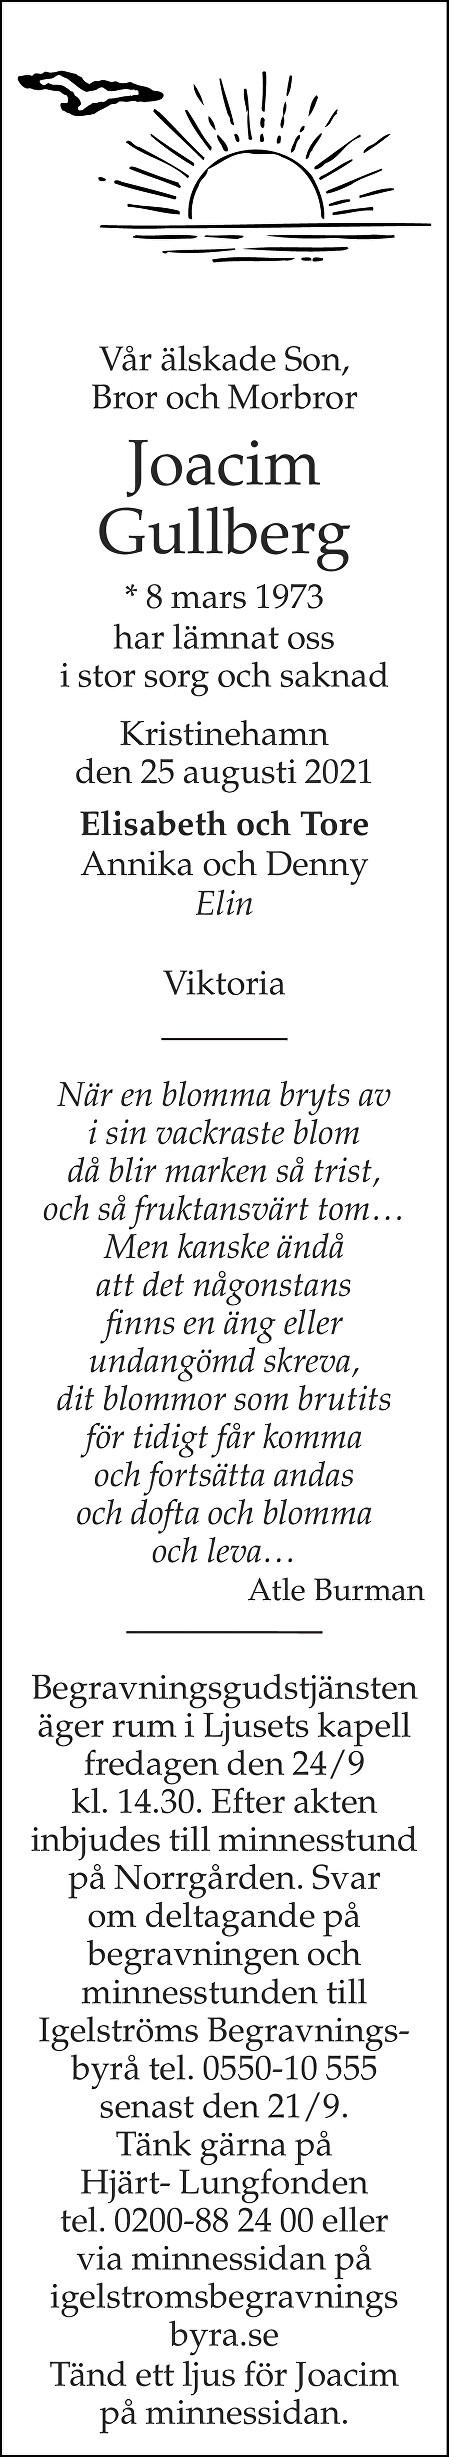 Joacim Gullberg Death notice